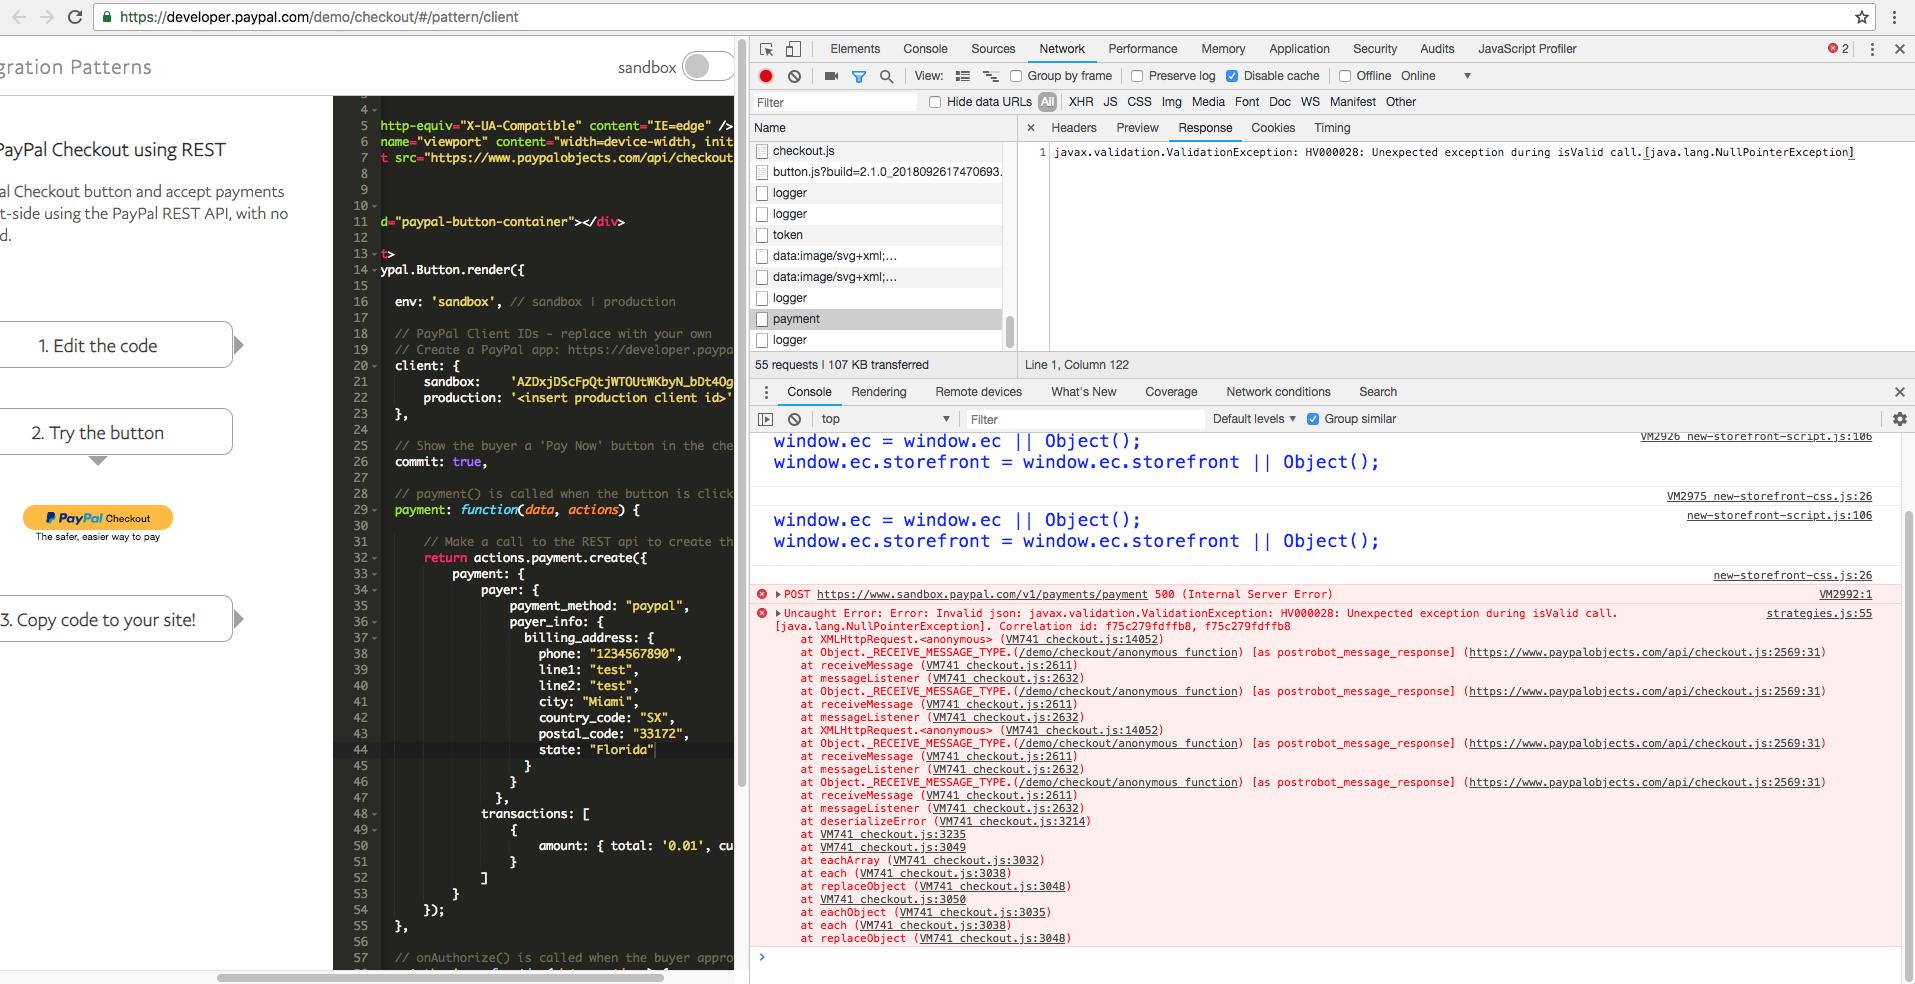 javax validation ValidationException: HV000028: Unexpected exception